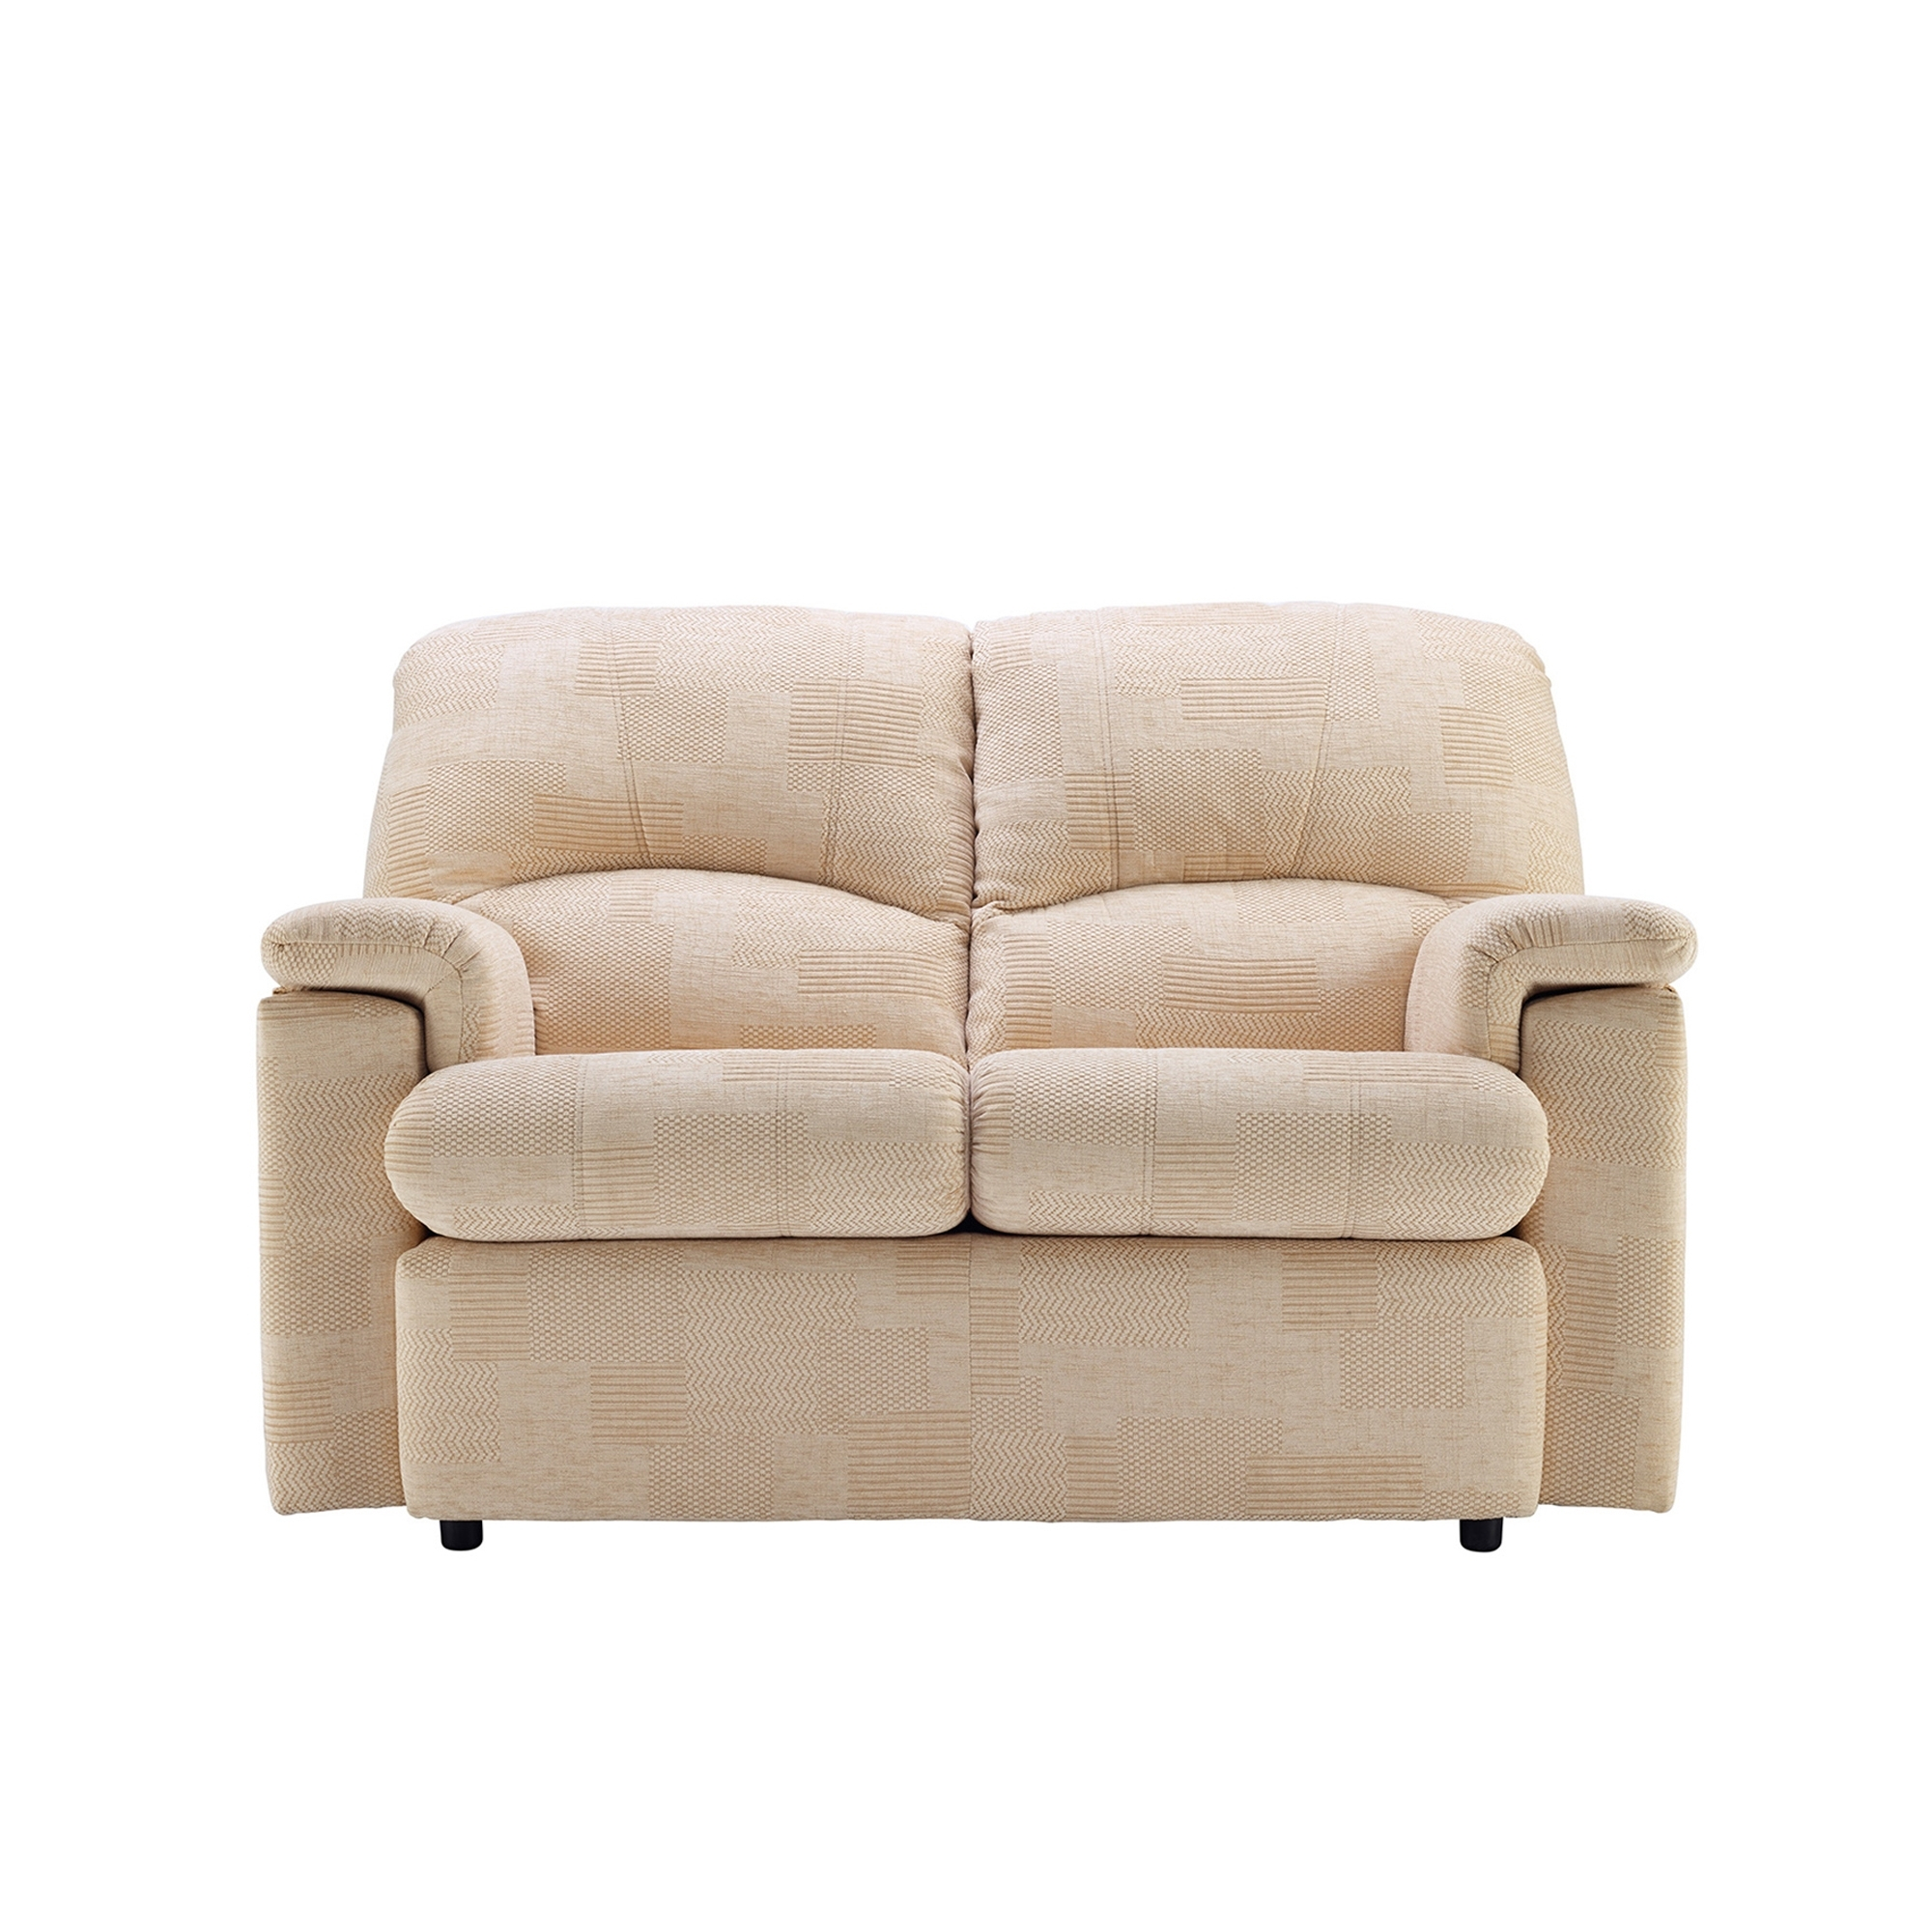 Chloe 2 Seater Dp Recliner Sofa Cookes Furniture